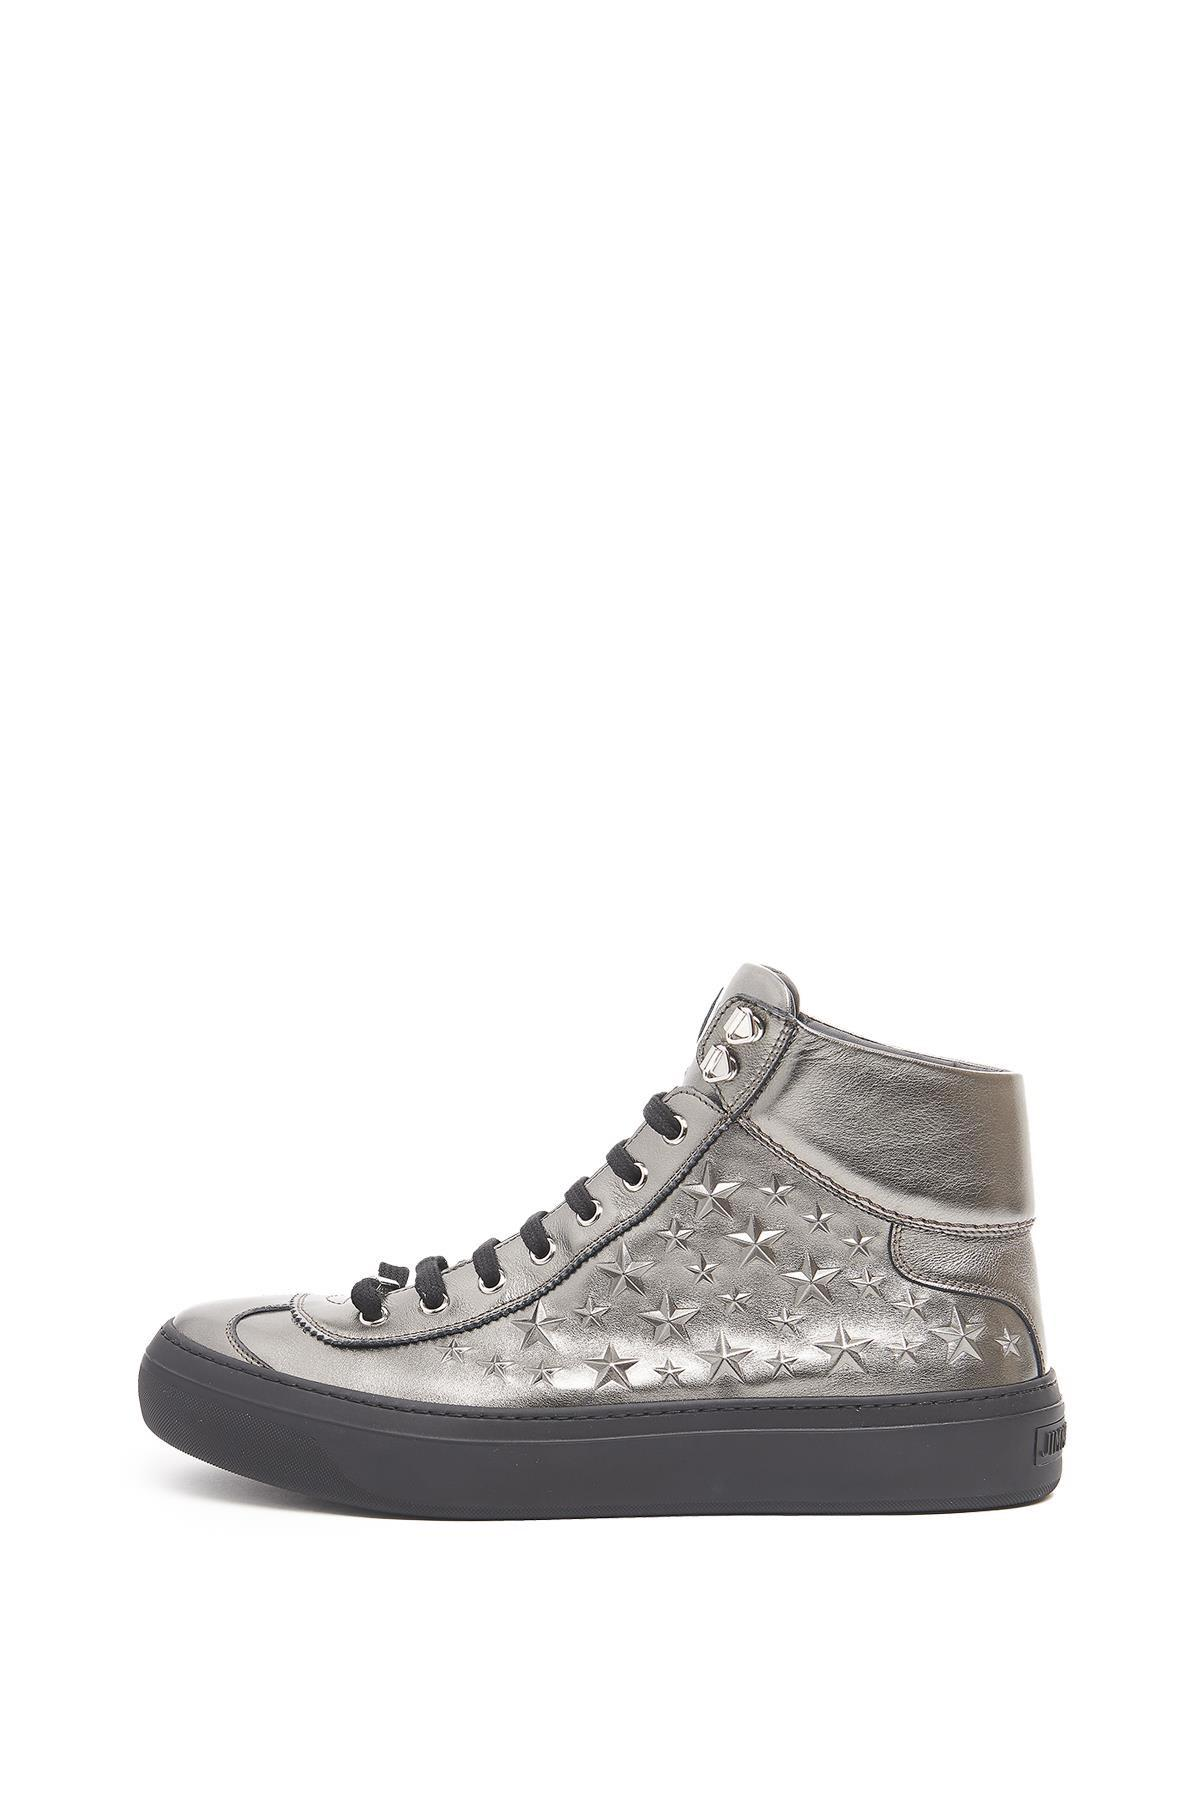 77c5e42ebf50 Lyst - Jimmy Choo  argyle  Sneakers in Gray for Men